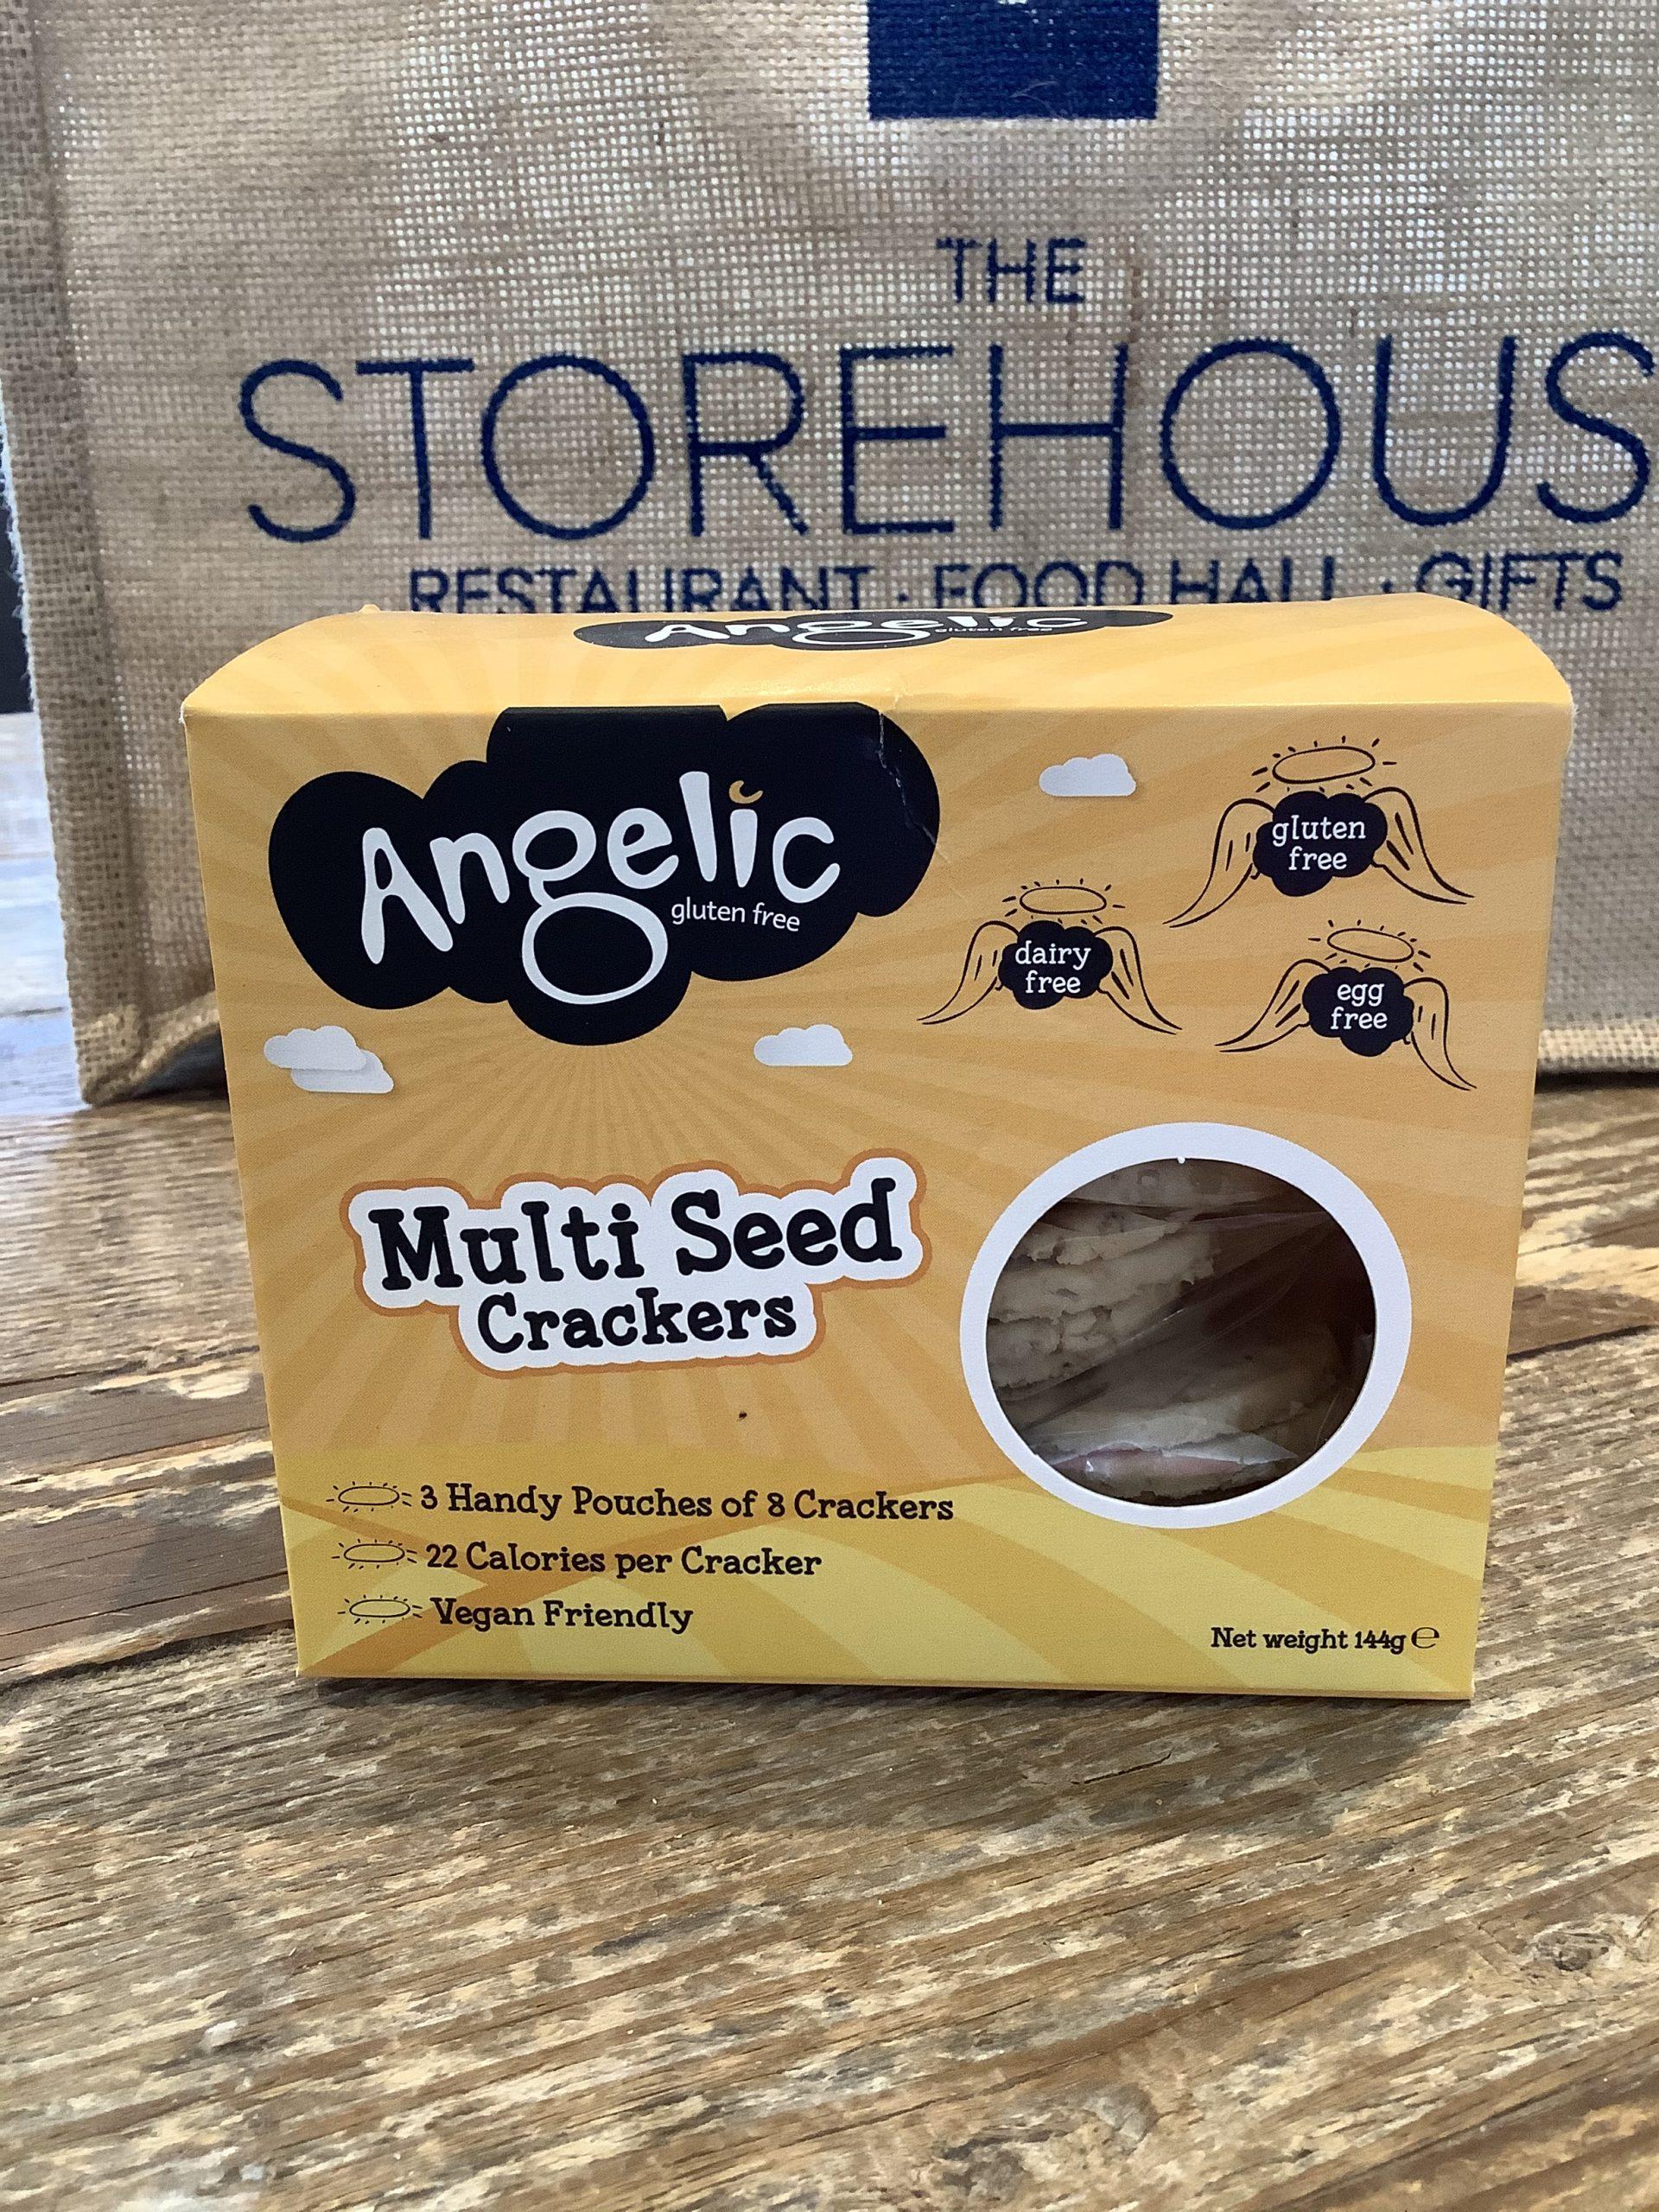 Angelic Multi Seed Crackers